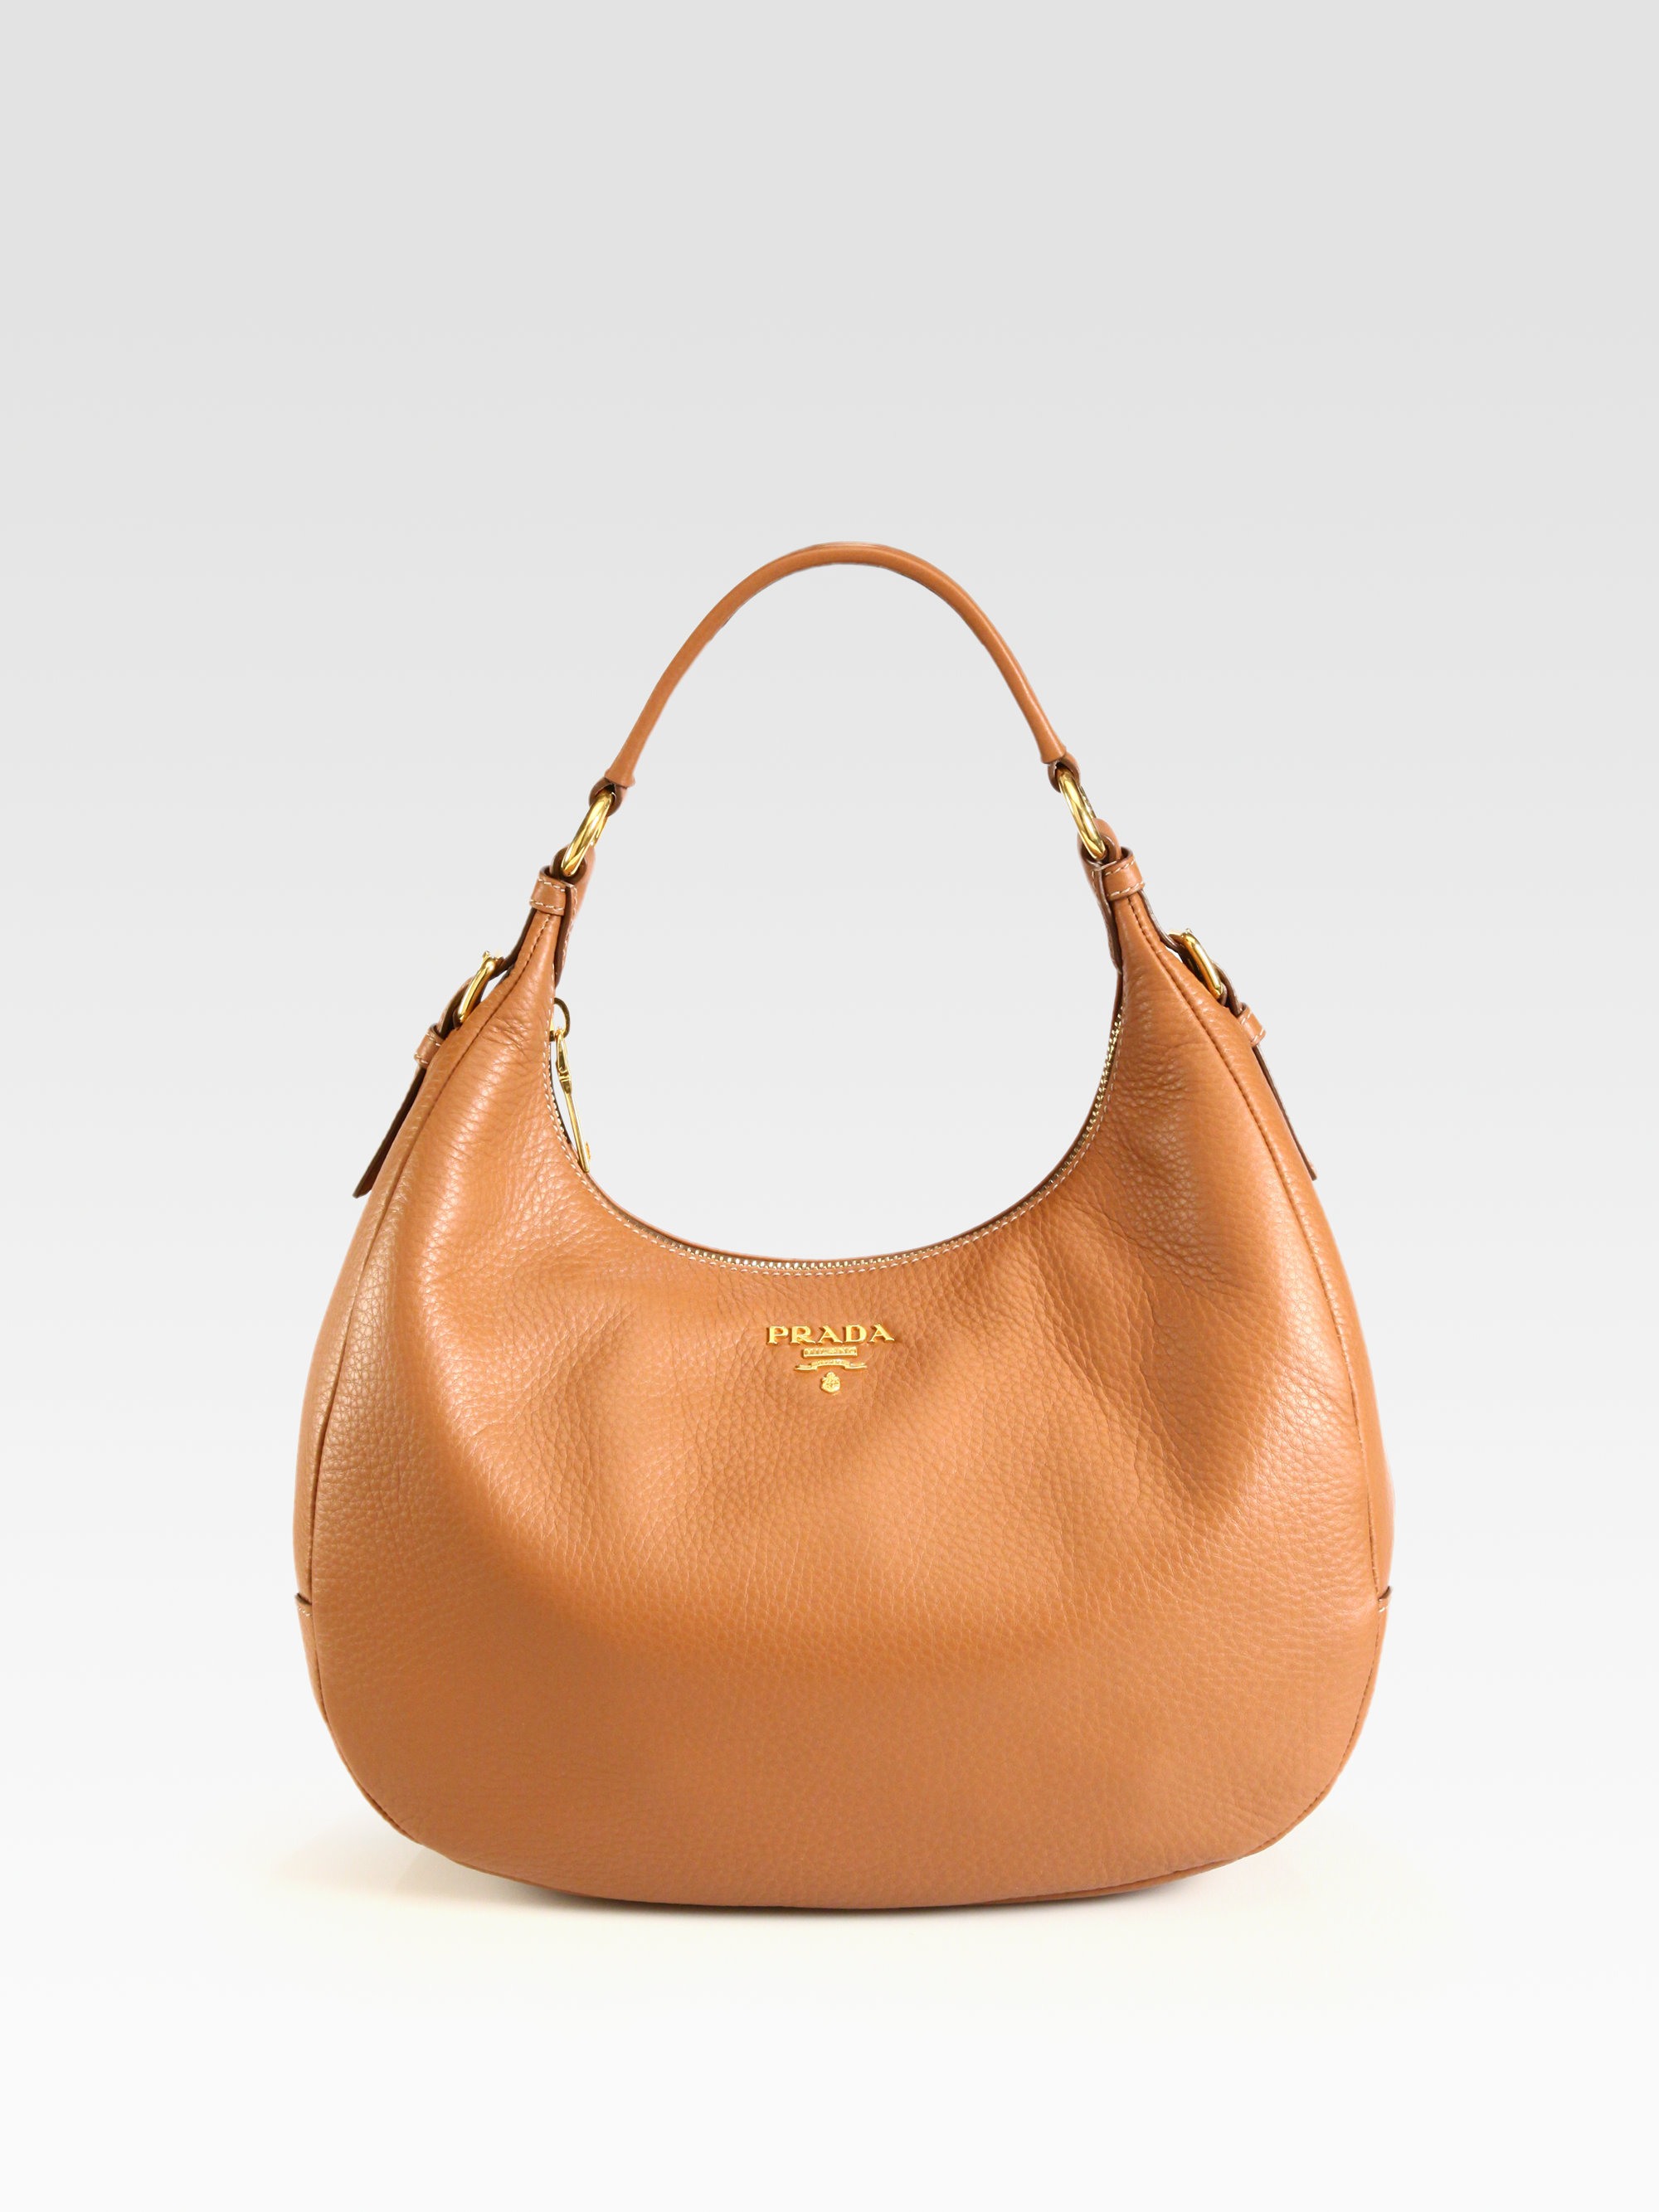 buy diagramme medium leather shoulder bag prada 77ddb af1de  coupon code  for lyst prada vitello daino small hobo in brown 36d08 90aa9 9b8c7dff22